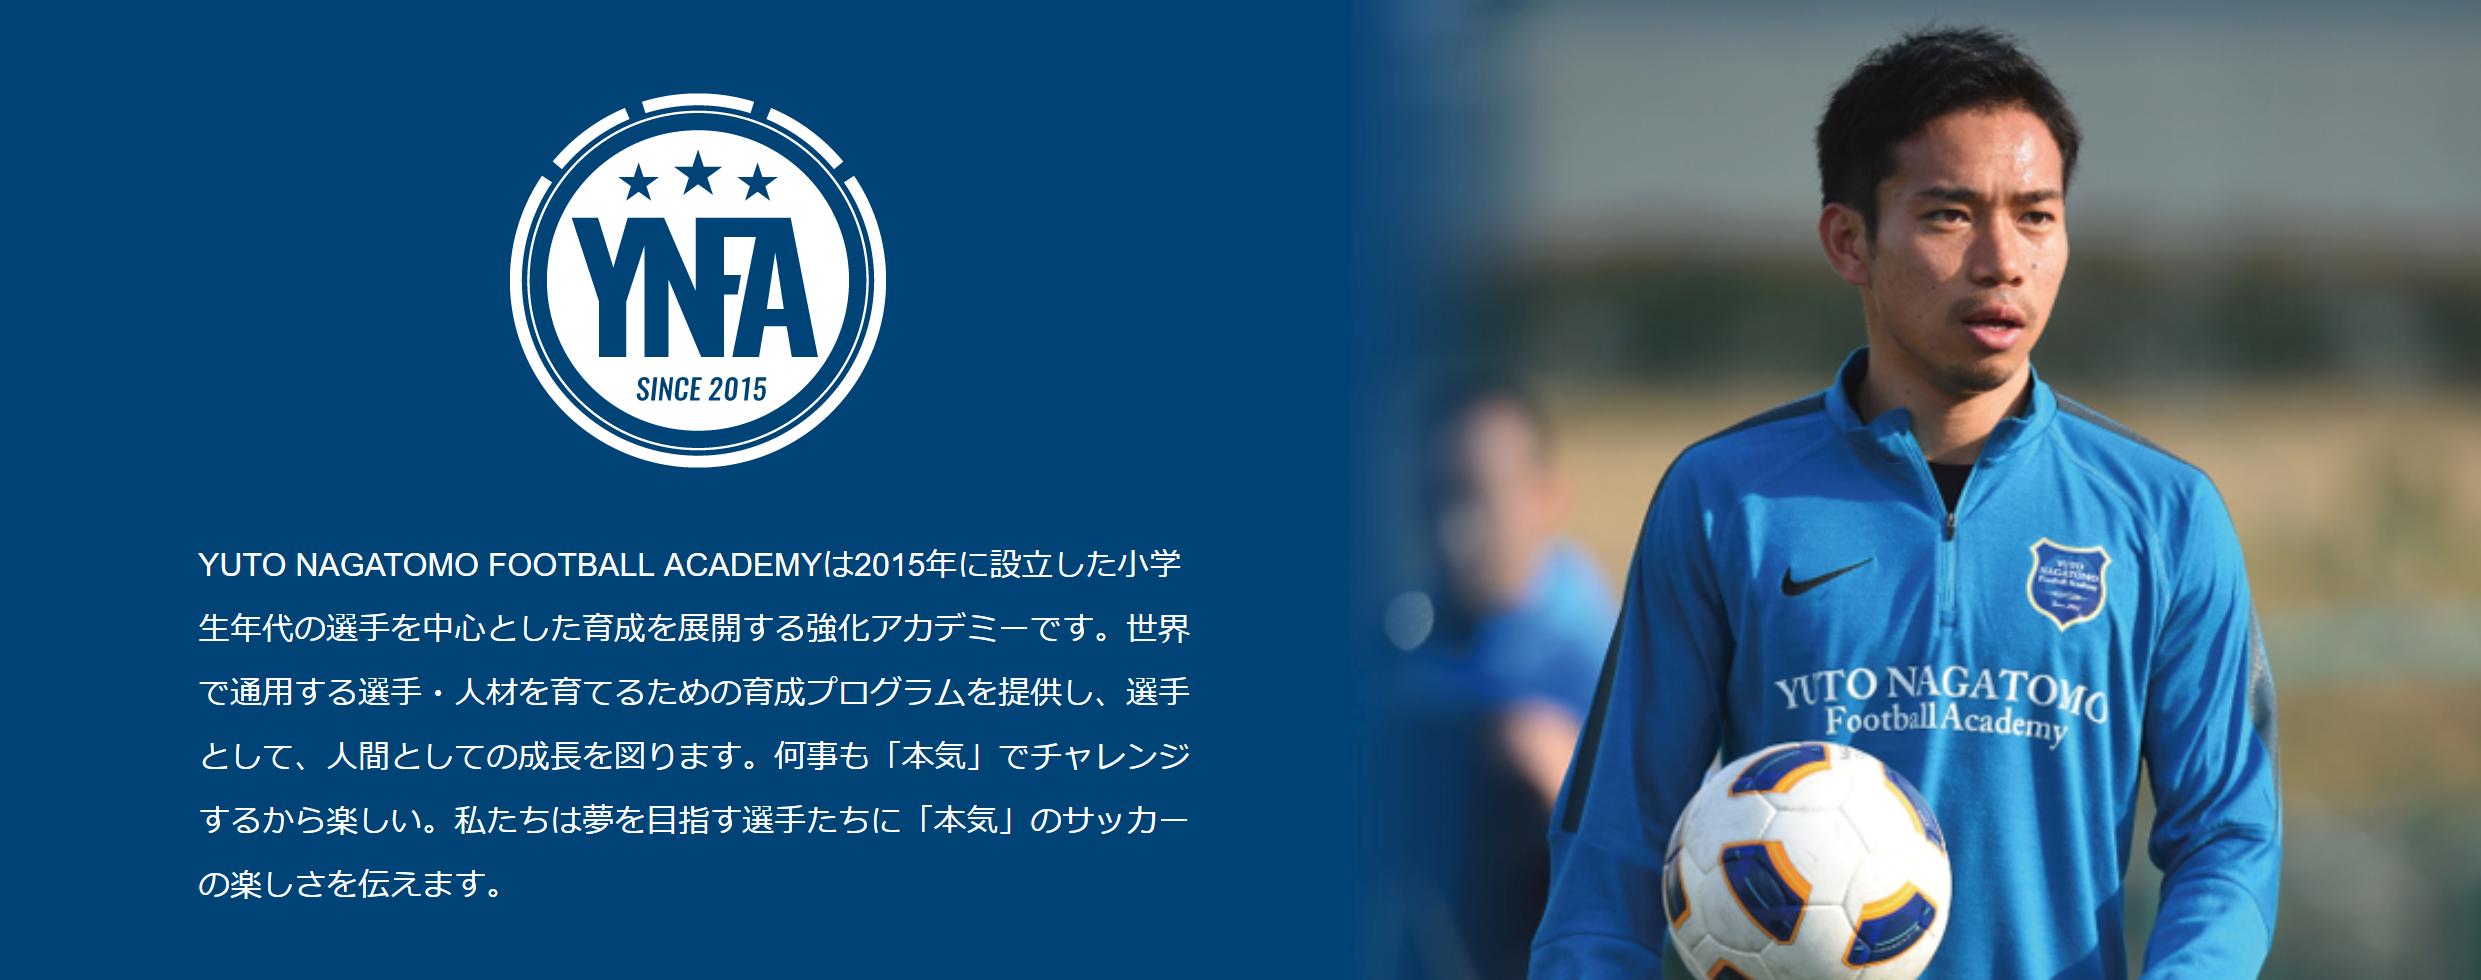 < https://nagatomo-football-academy.com/index.html >